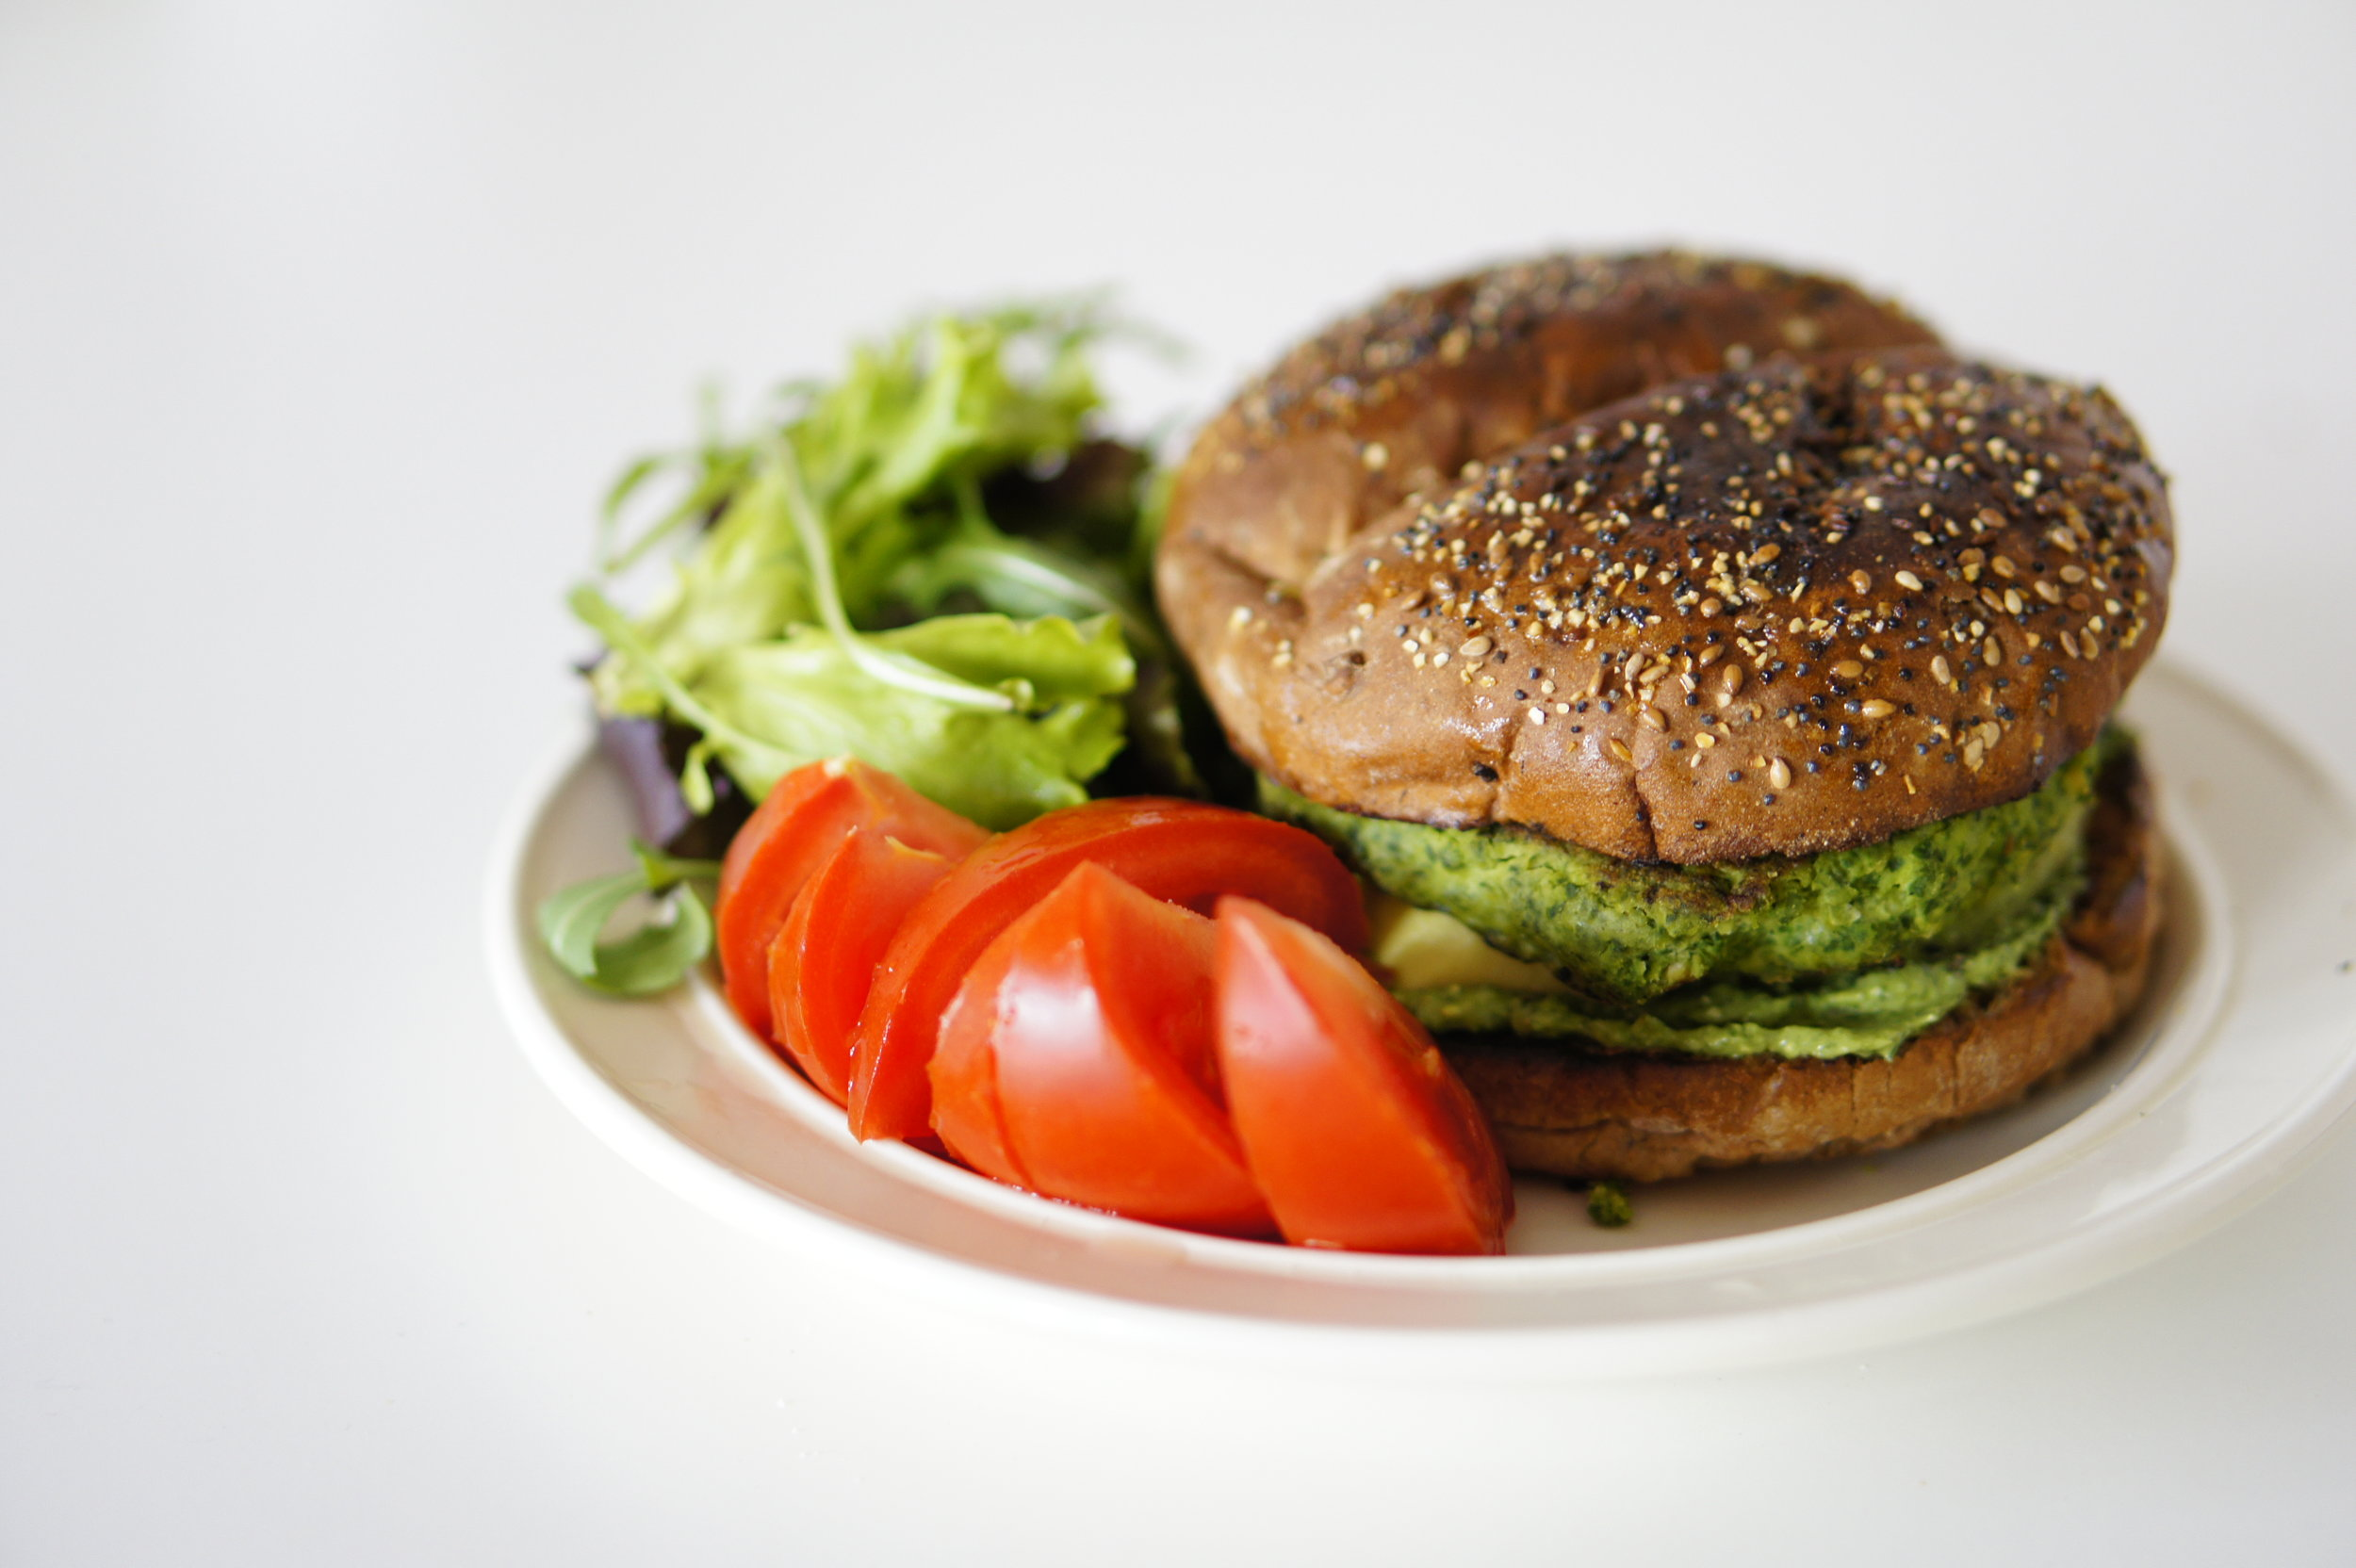 More Big Brands Get Behind Plant-Based Burger Bonanza -